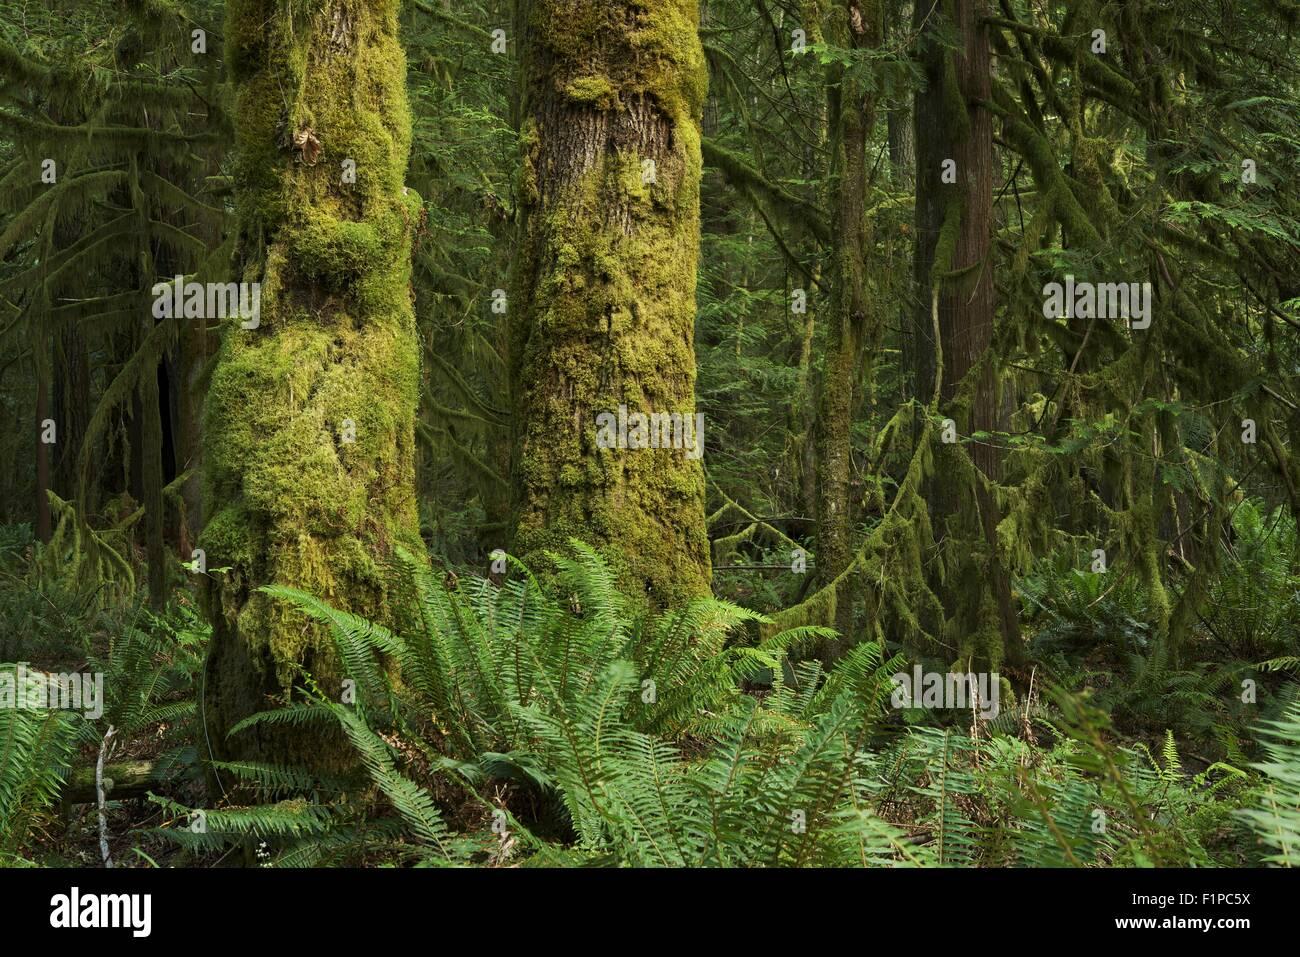 Washington State Rainforest Landscape. Deep Mossy Pacific Northwest Forest.  Nature Photography Collection - Washington State Rainforest Landscape. Deep Mossy Pacific Northwest